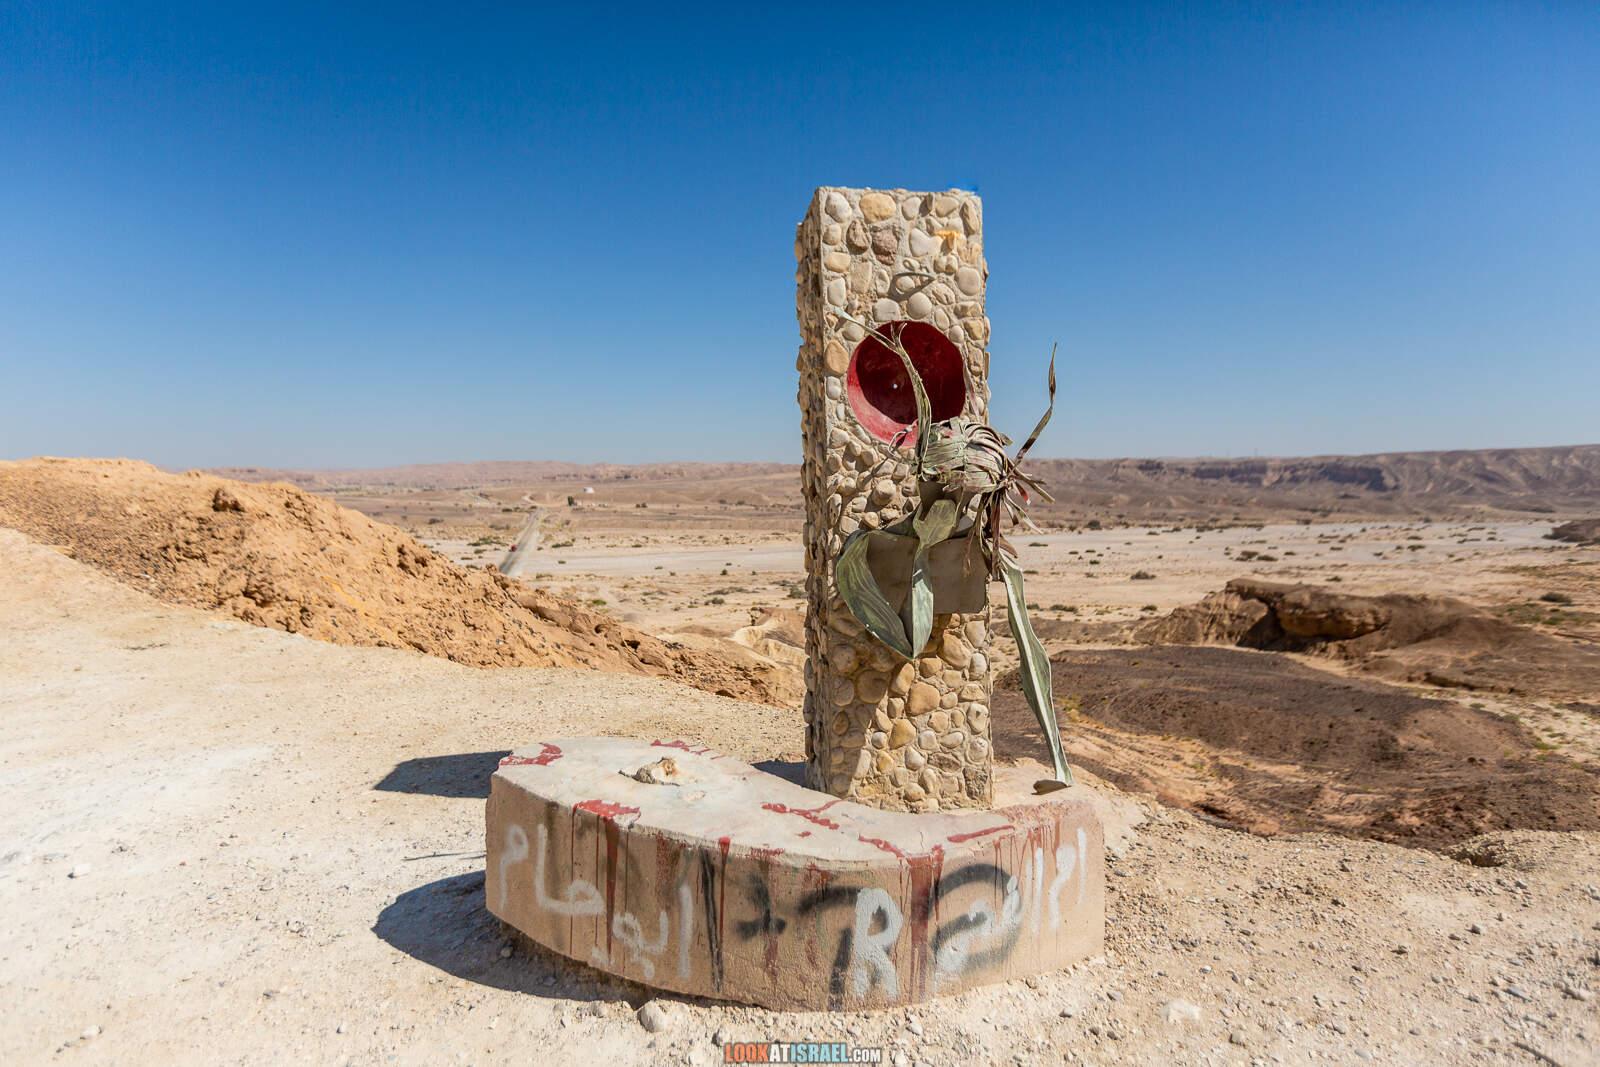 Мемориал памяти британскому туристу